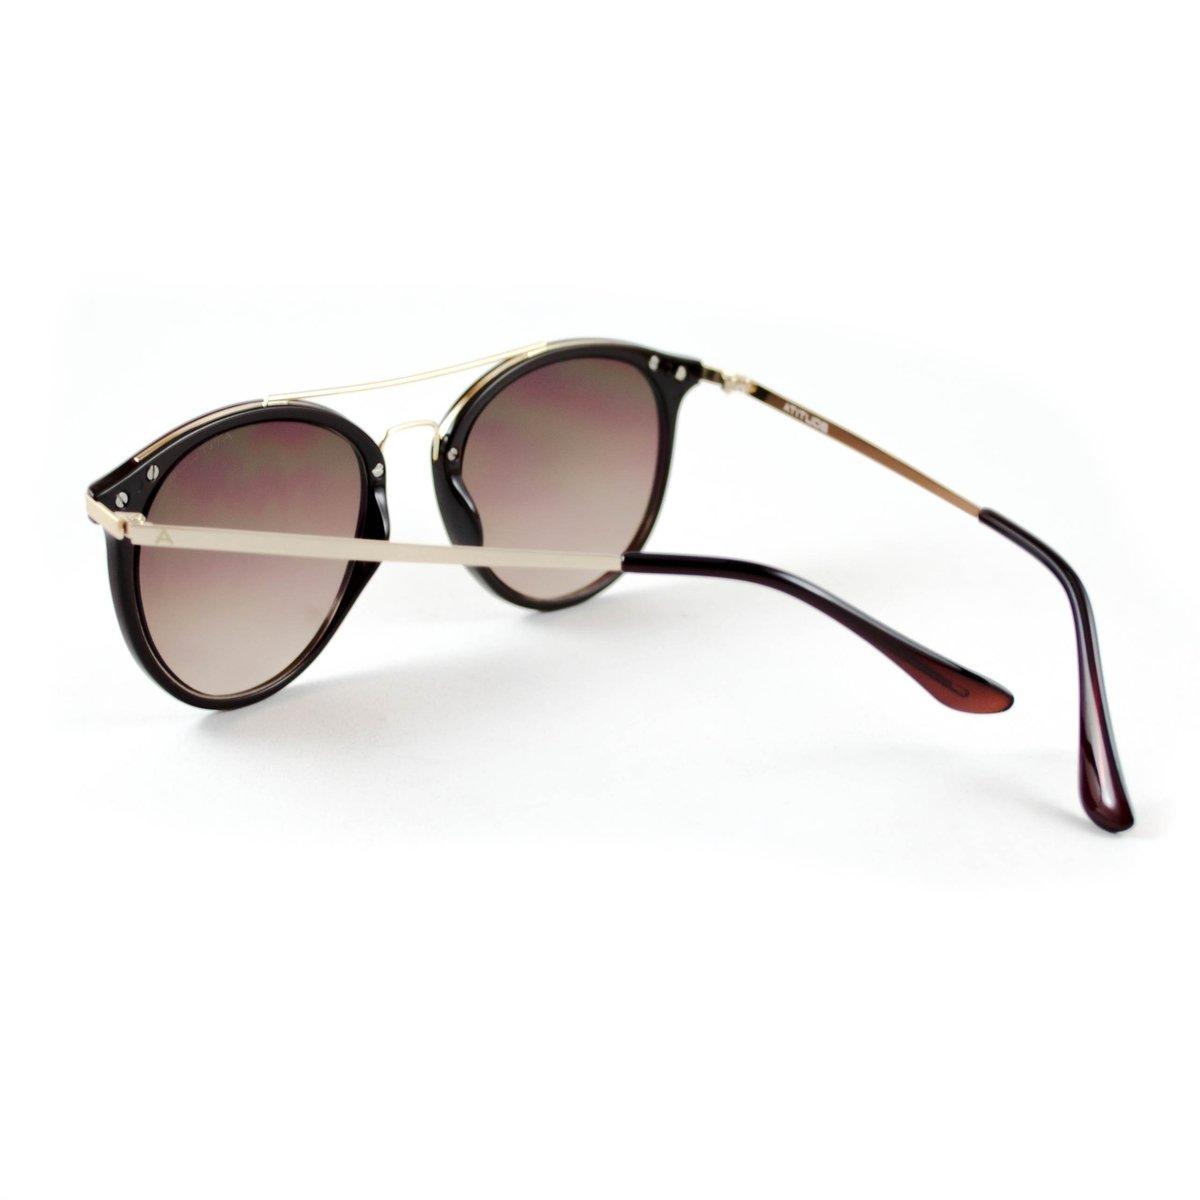 Óculos Atitude - AT5345 T01 - Compre Agora   Zattini c46efb6ee1